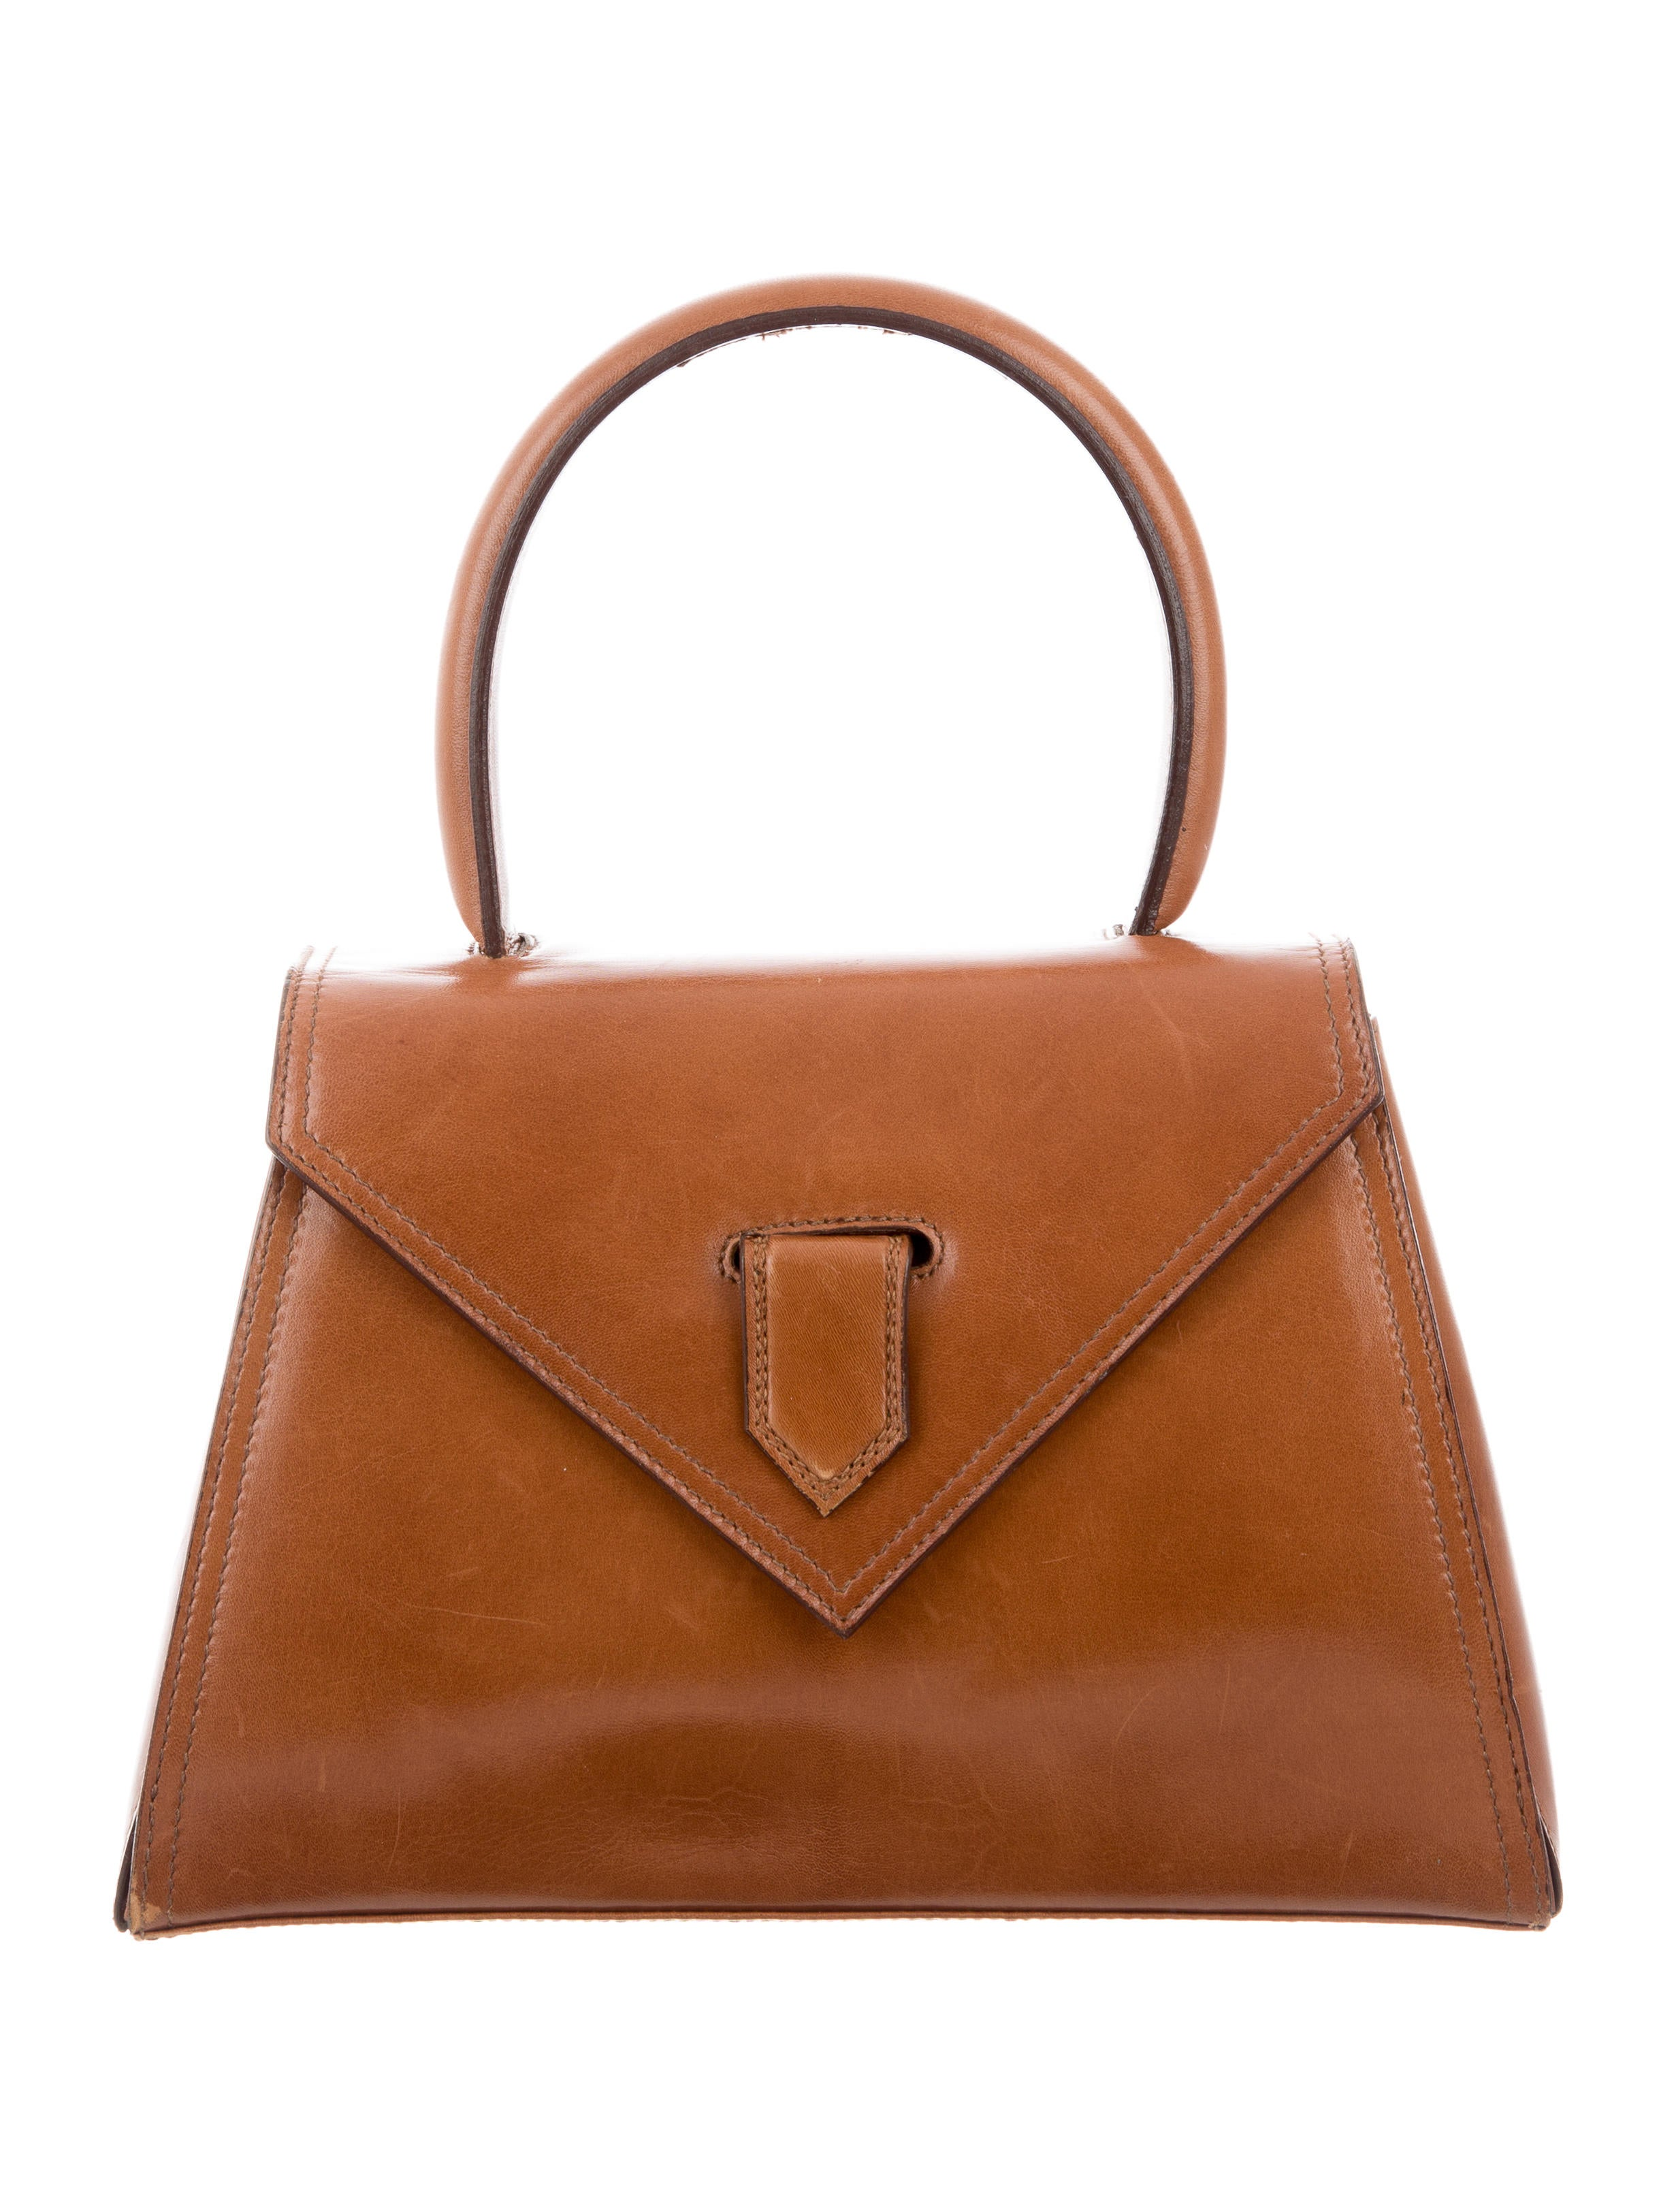 Walter Steiger Leather Handle Bag Handbags Sti20784